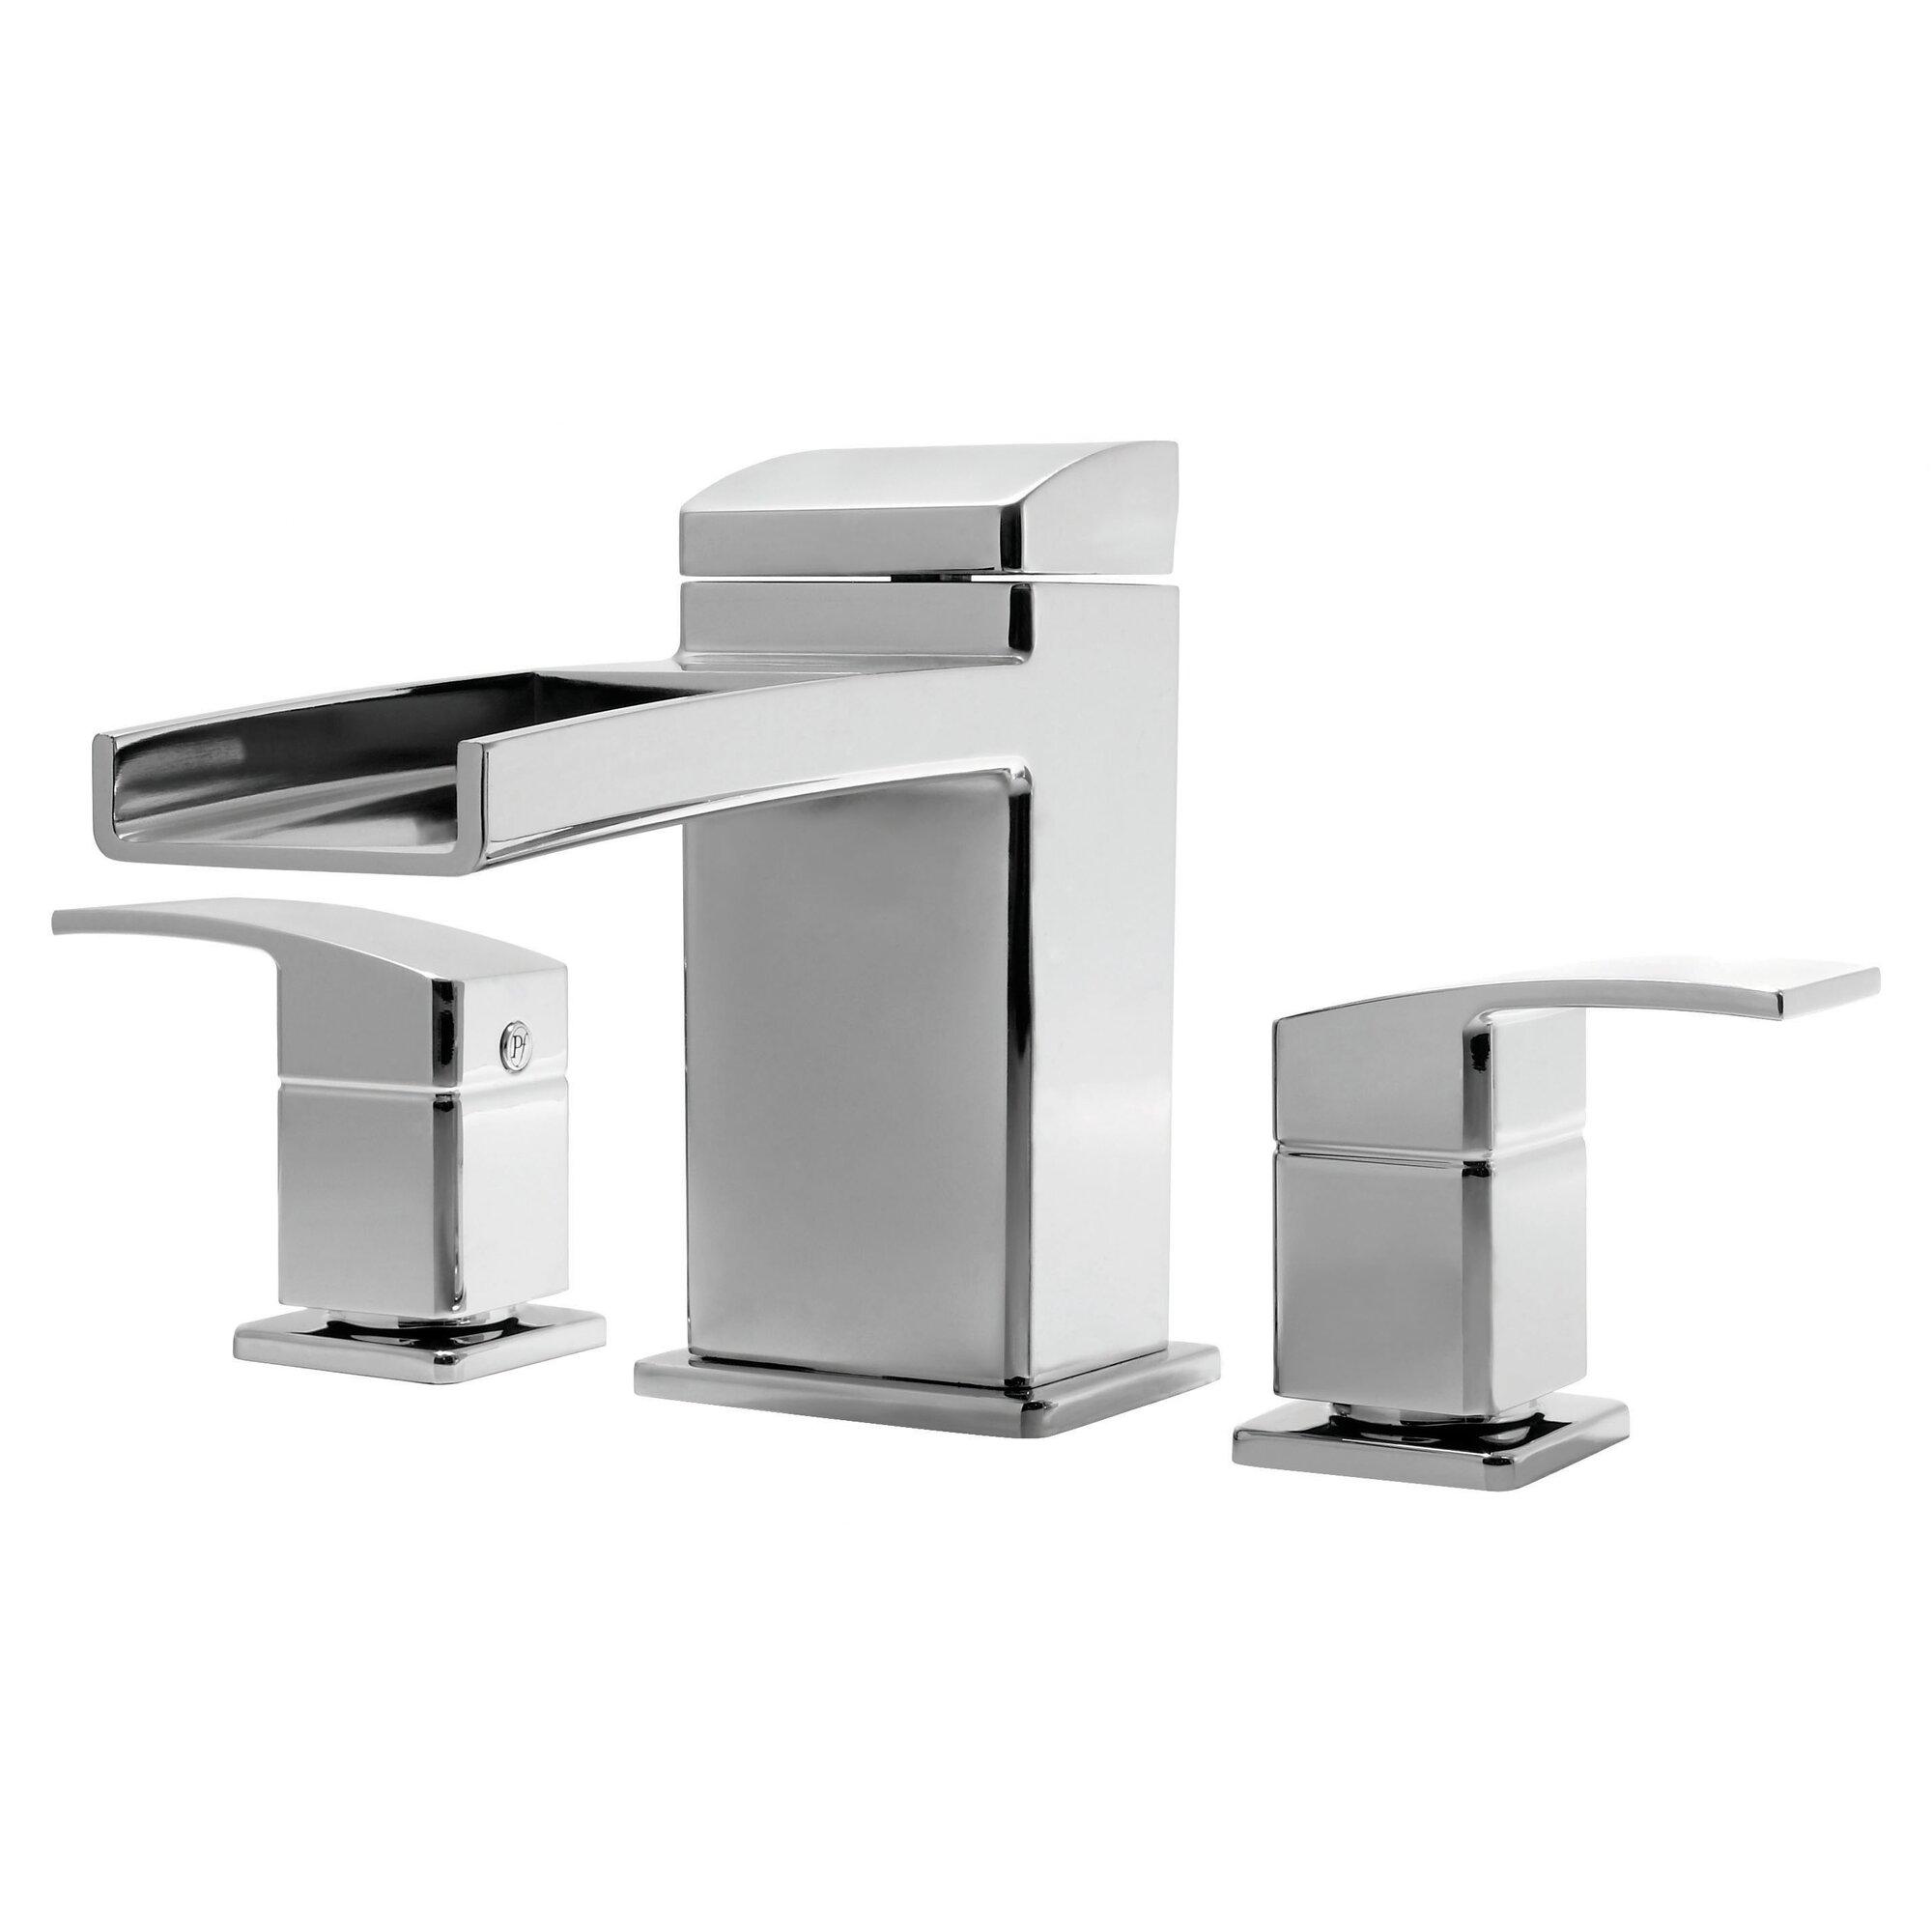 Modern Tub Faucets AllModern - Wall mount roman tub filler